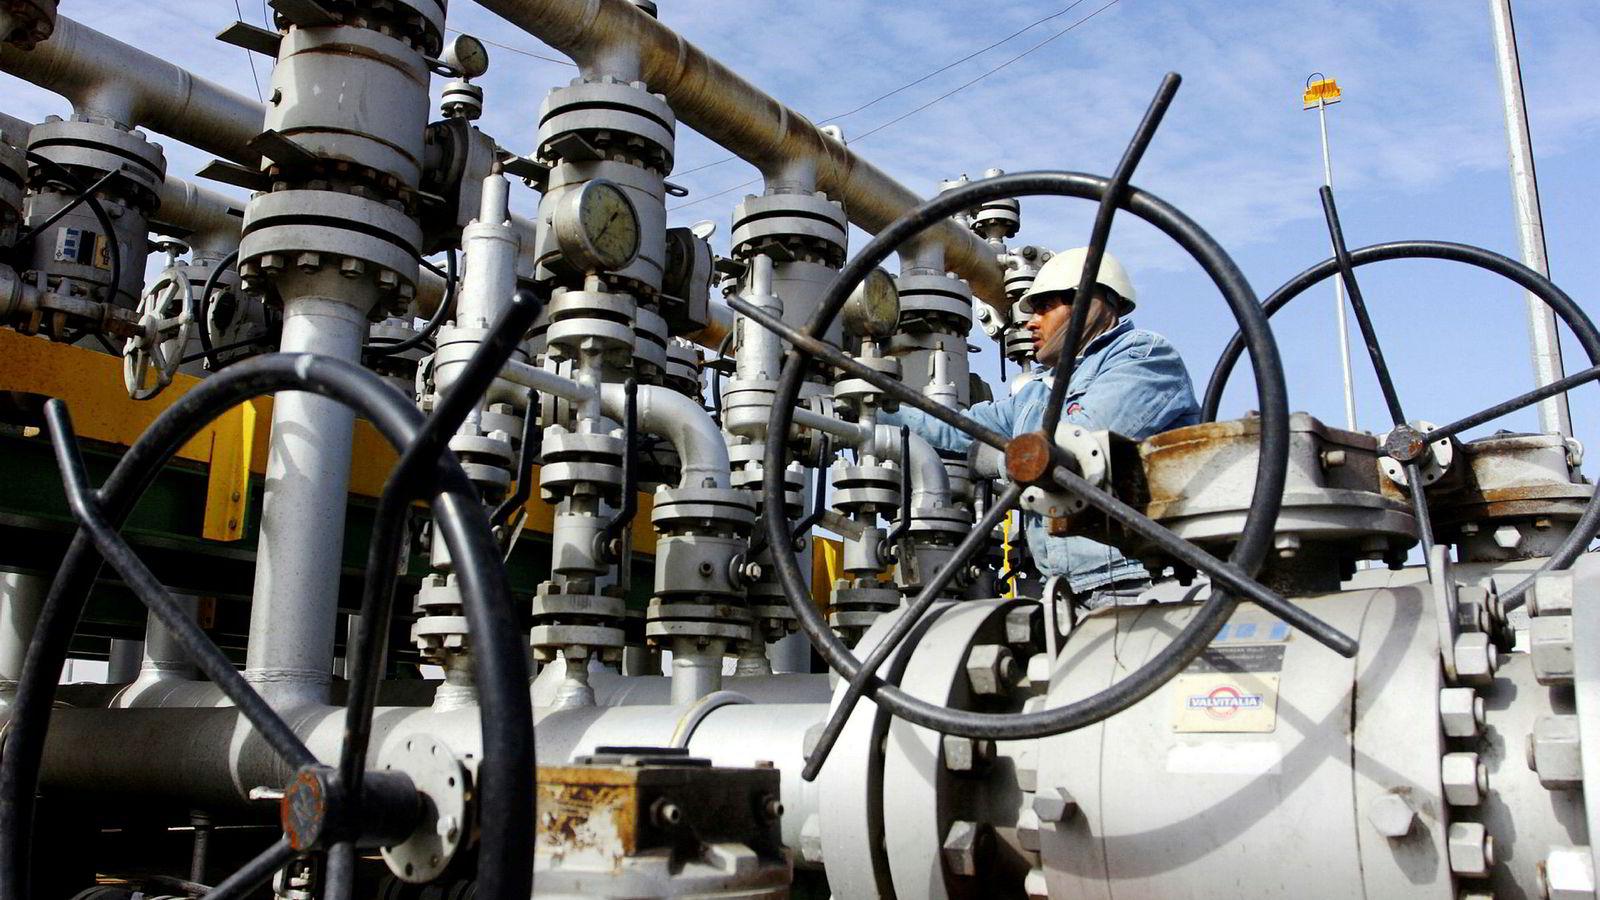 En oljearbeider undersøker ventilene på Al-Sheiba-raffineriet i Basra, Irak, 2016.